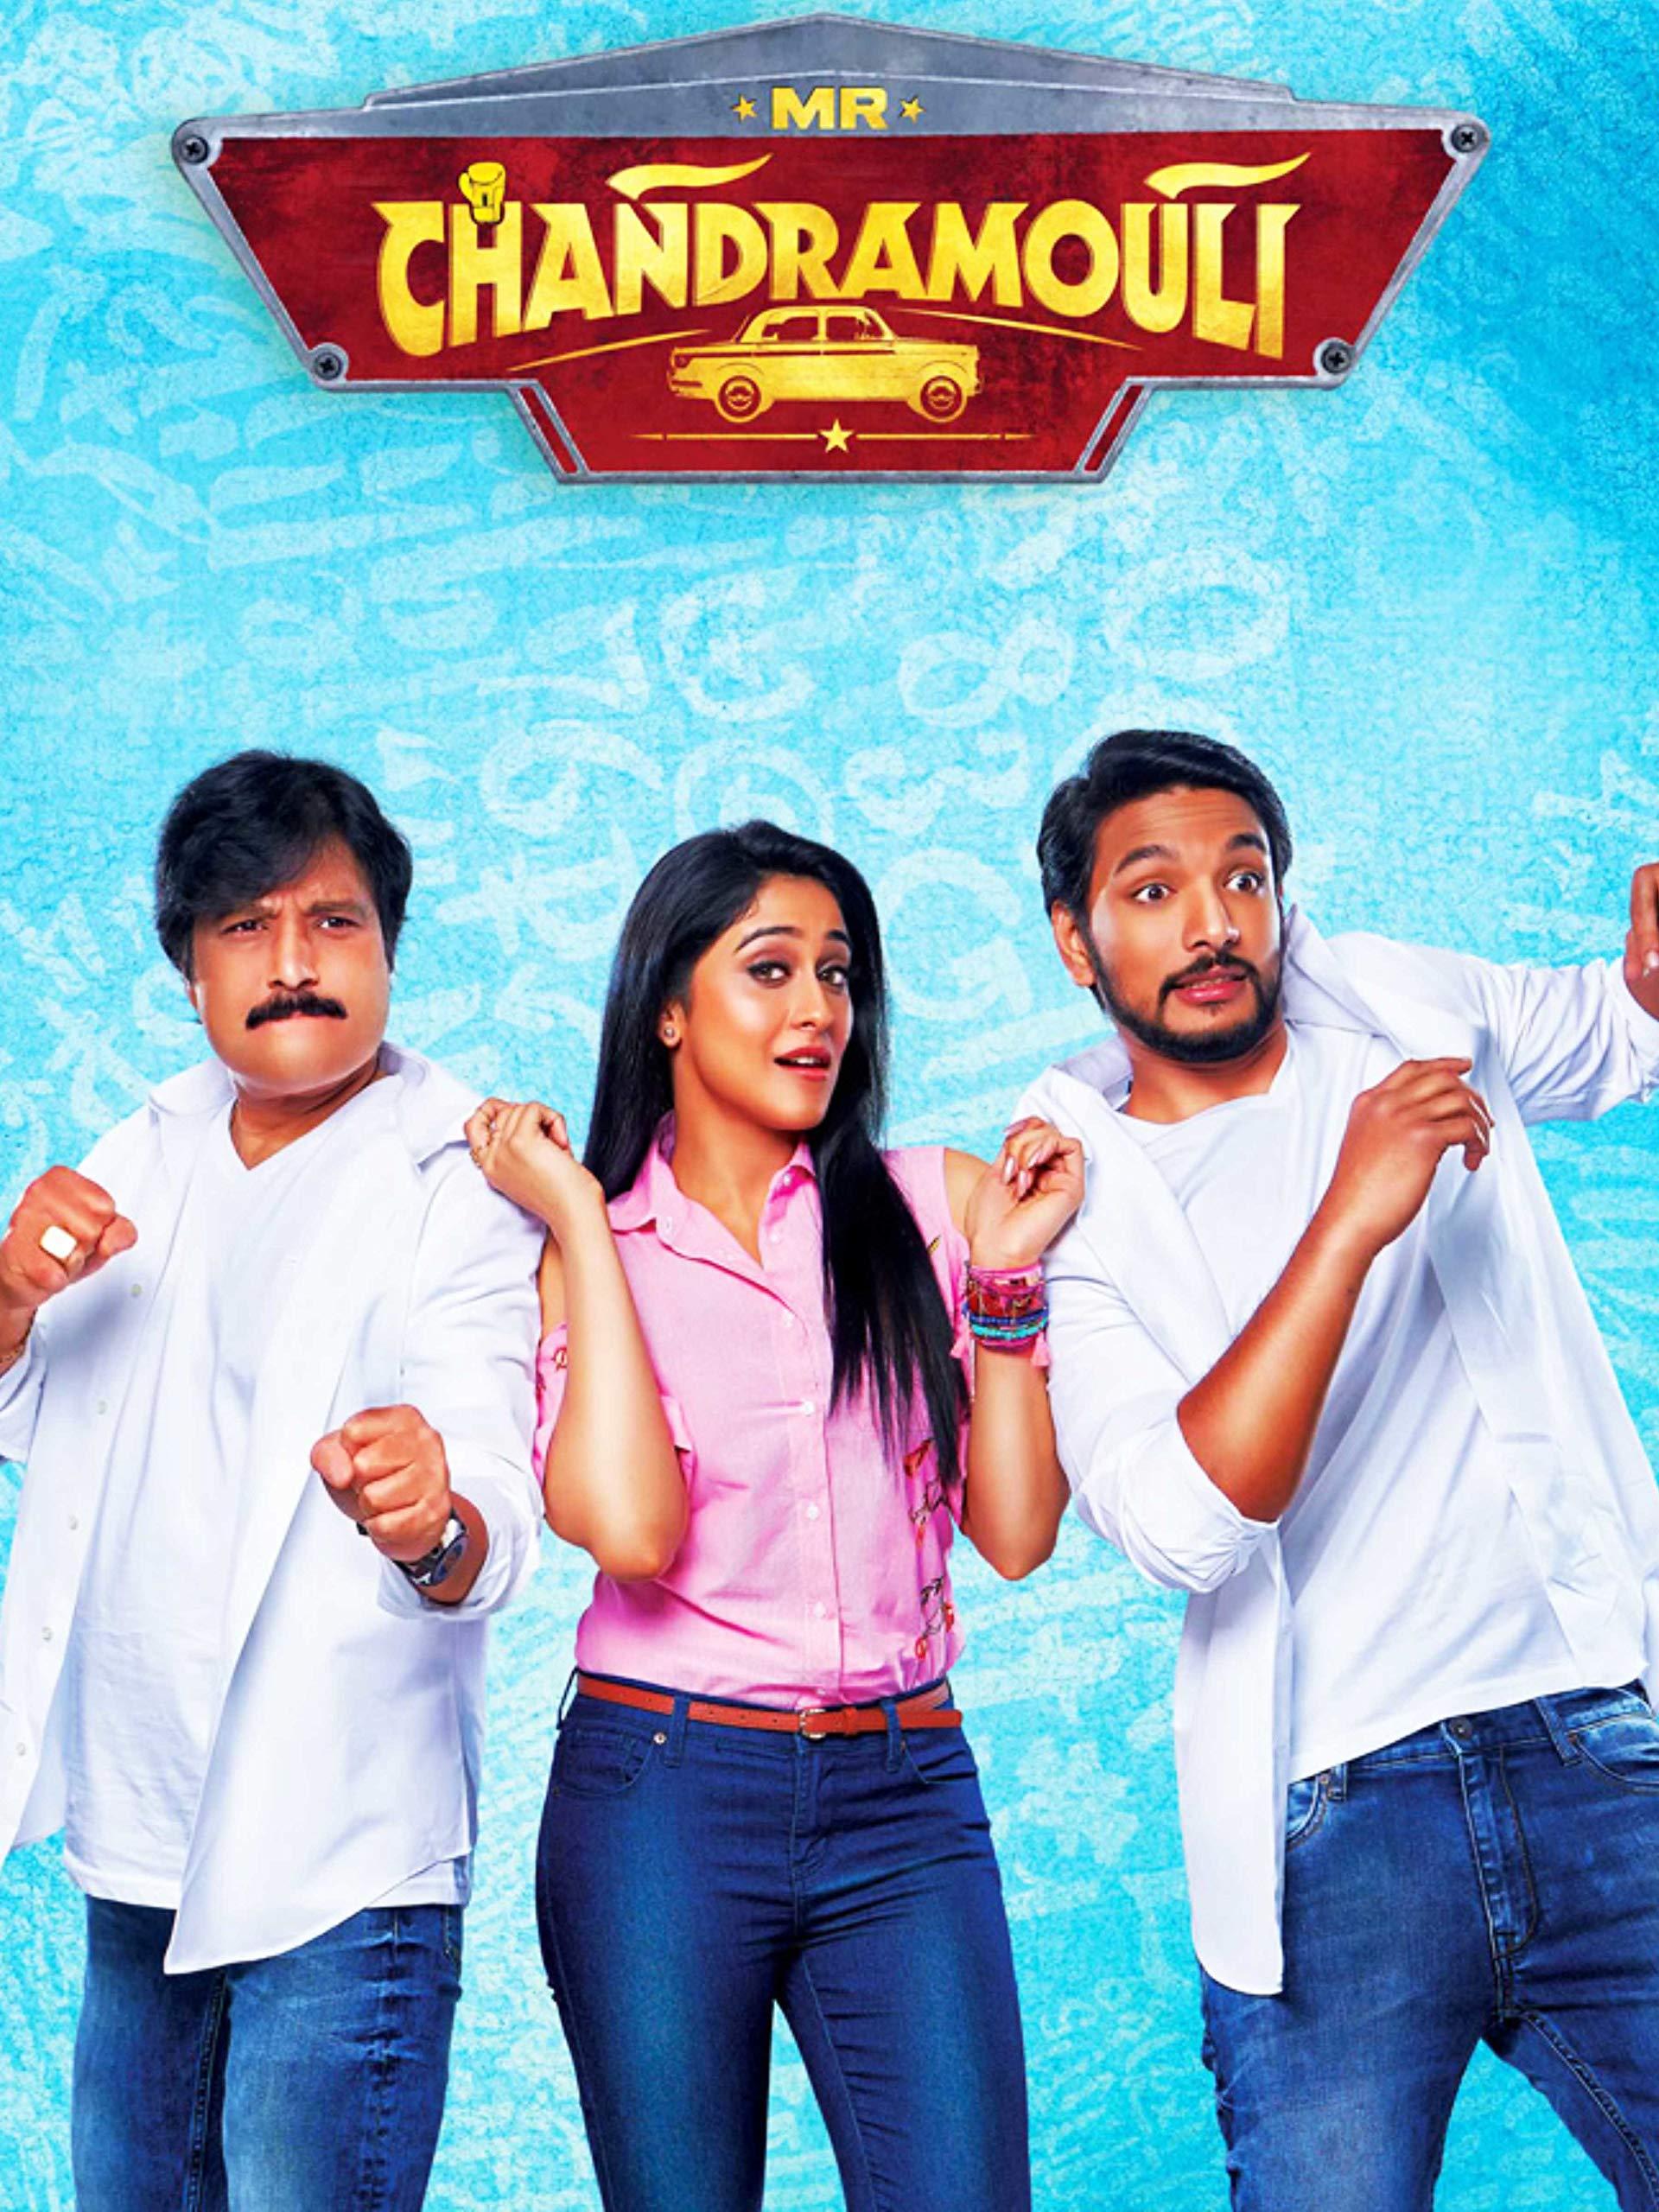 Mr. Chandramouli (2018) Hindi Dubbed 480p HDRip 350MB Download